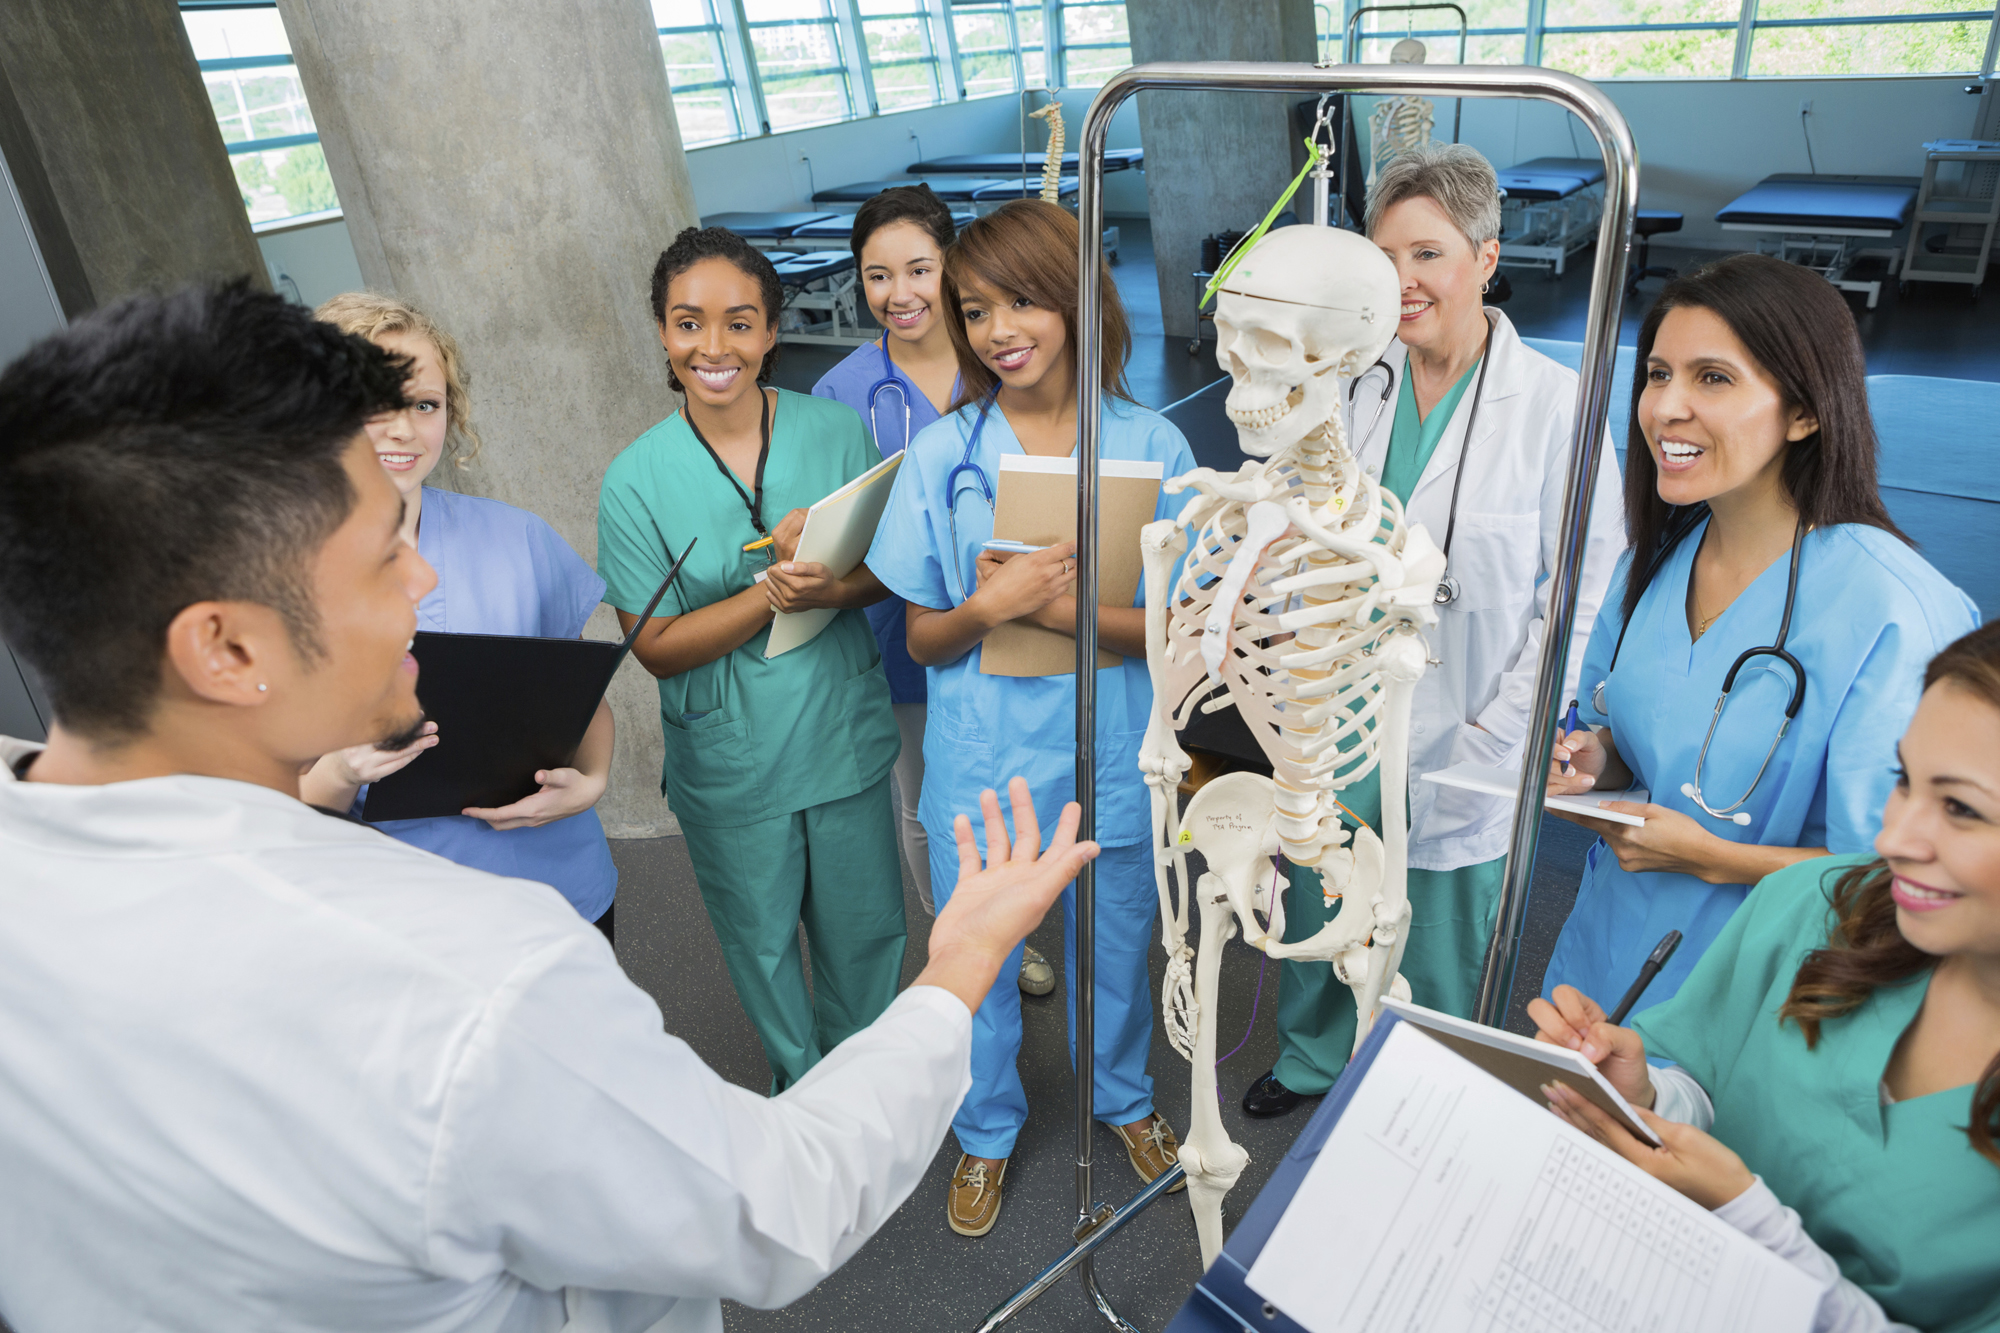 Magic Mirror' Skeletons Teach Med Students Anatomy   Faculty of Medicine